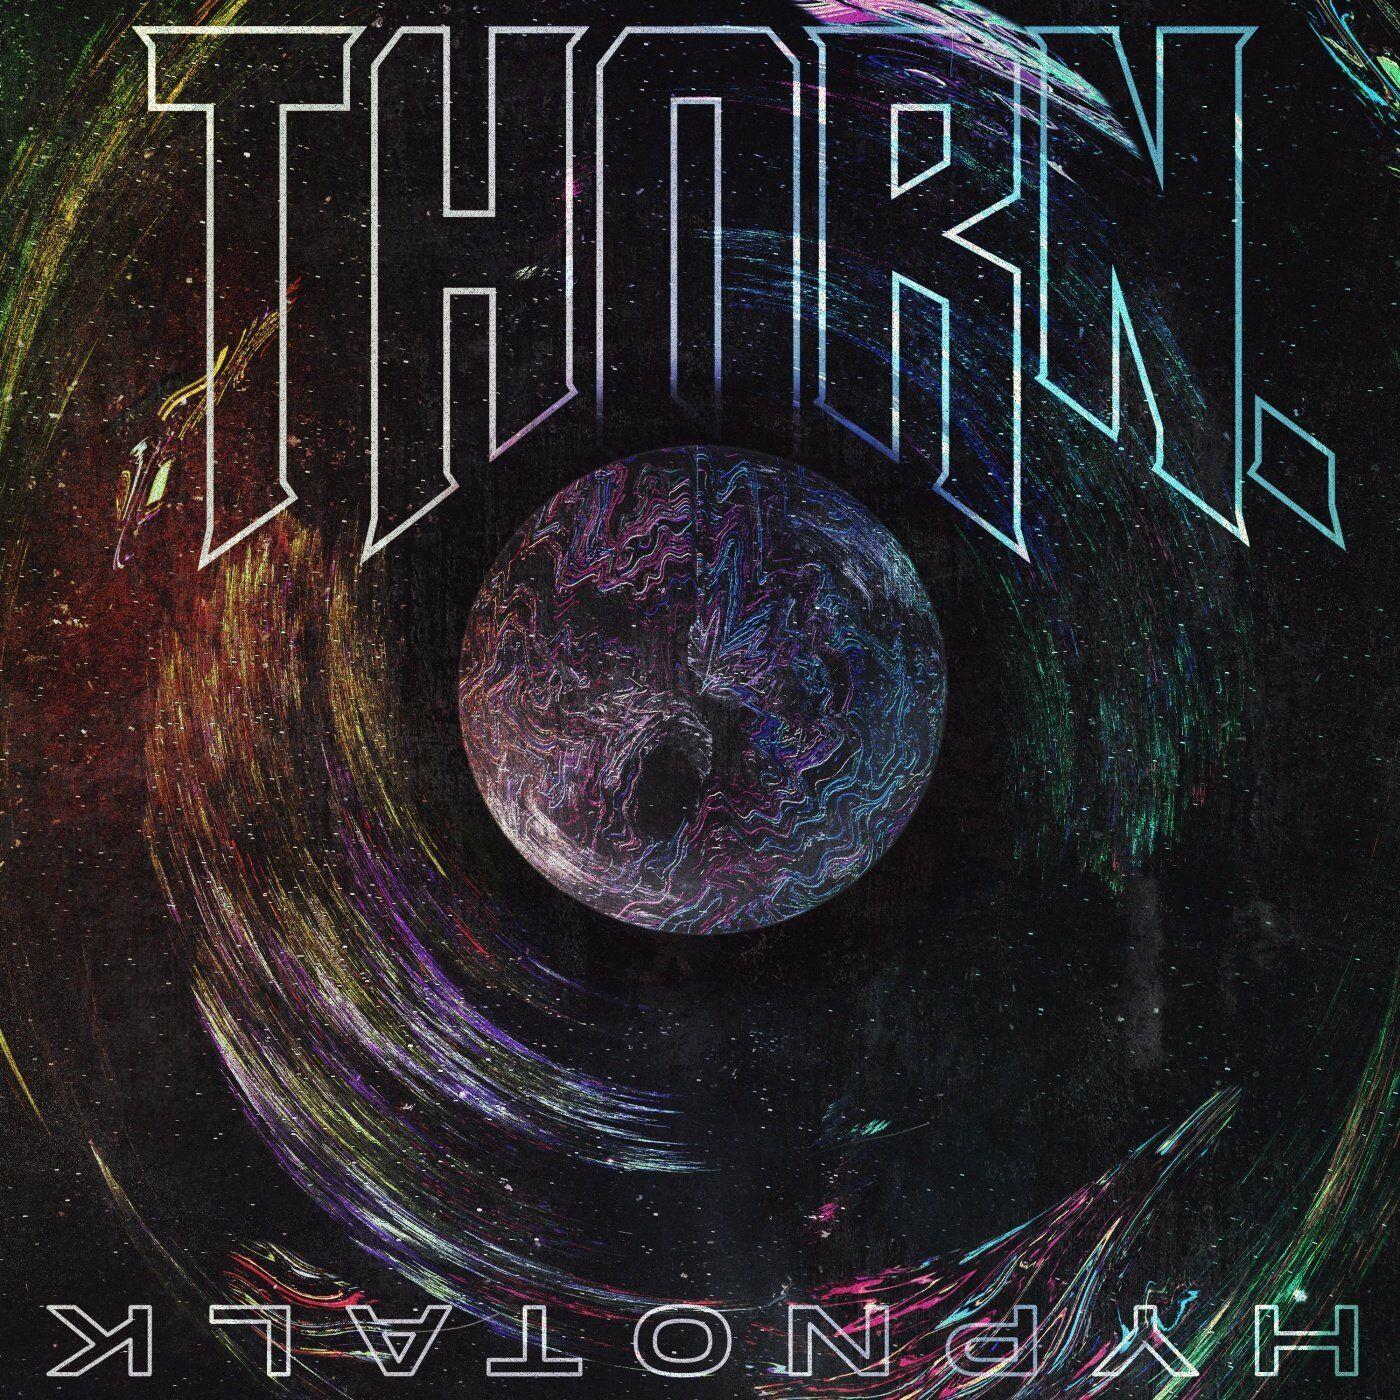 THORN. - Alienate [single] (2020)